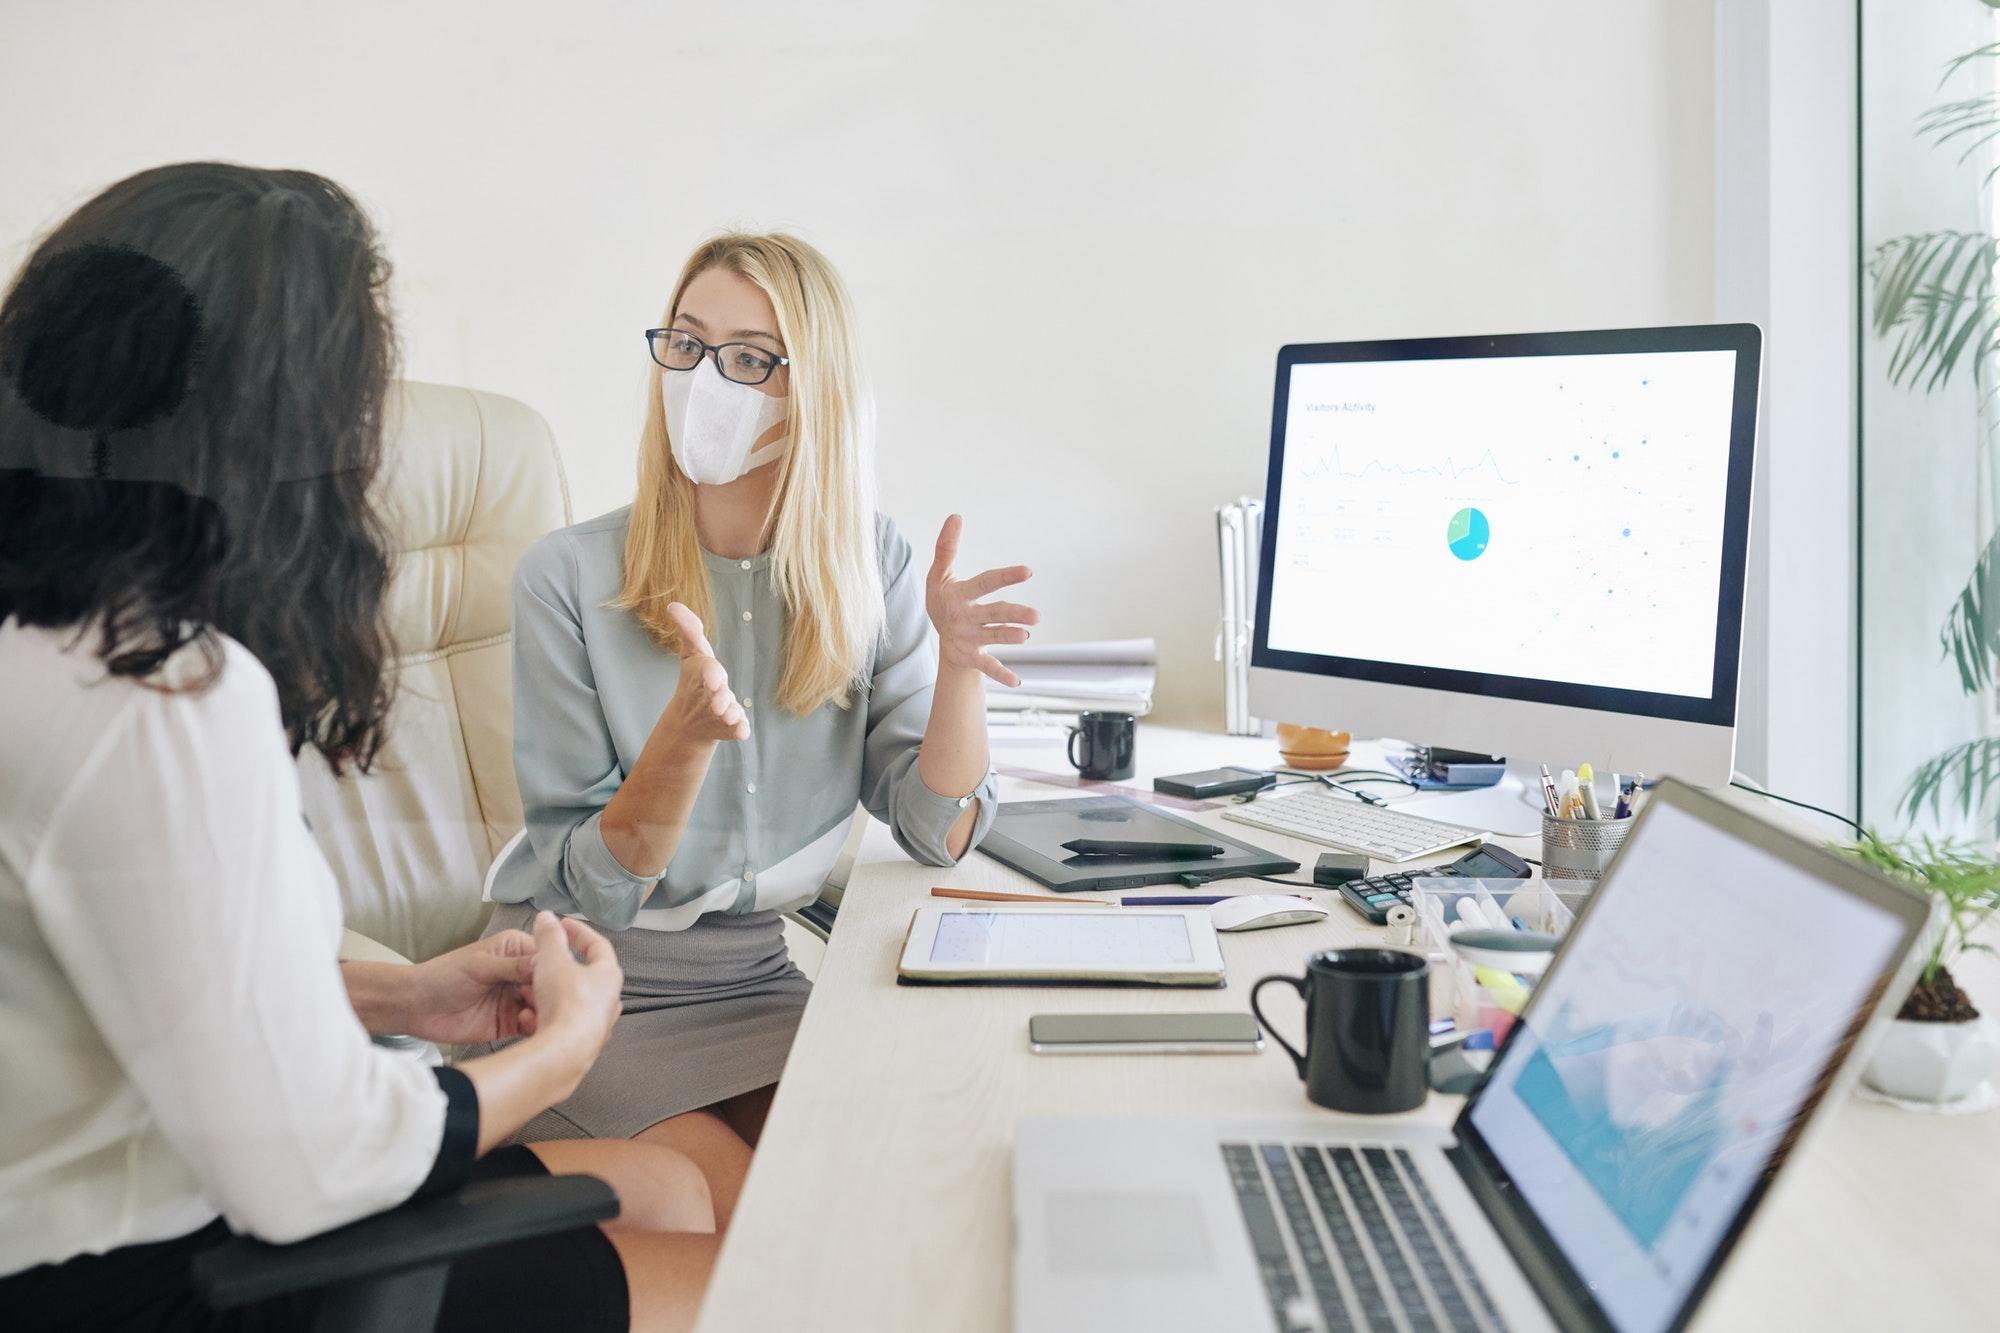 Businesswoman in medical mask explaining her idea